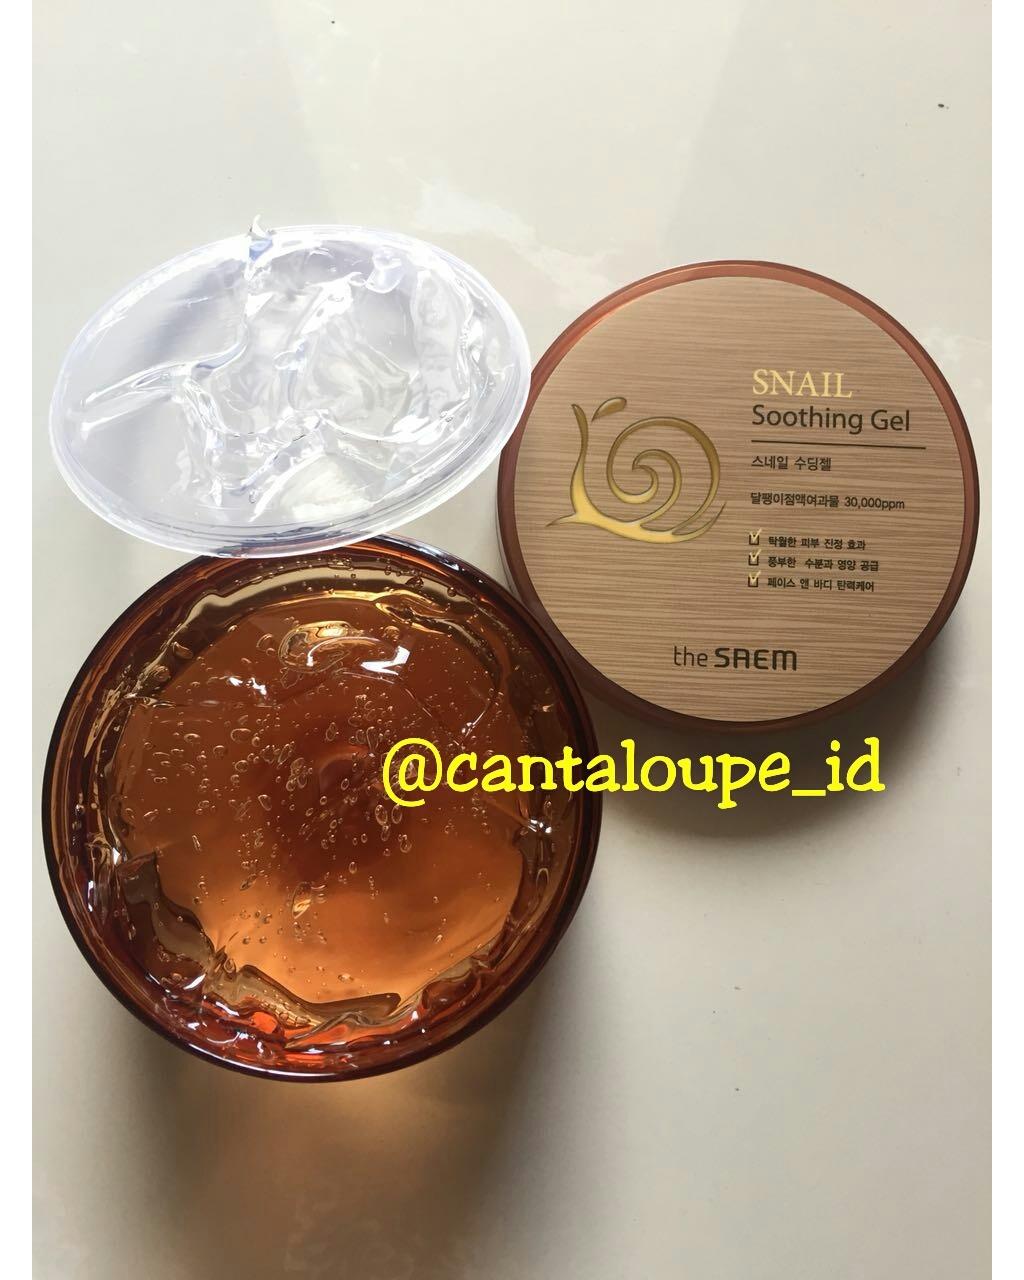 Jual Snail Soothing Gel The Saem Cantaloupe Indonesia Tokopedia